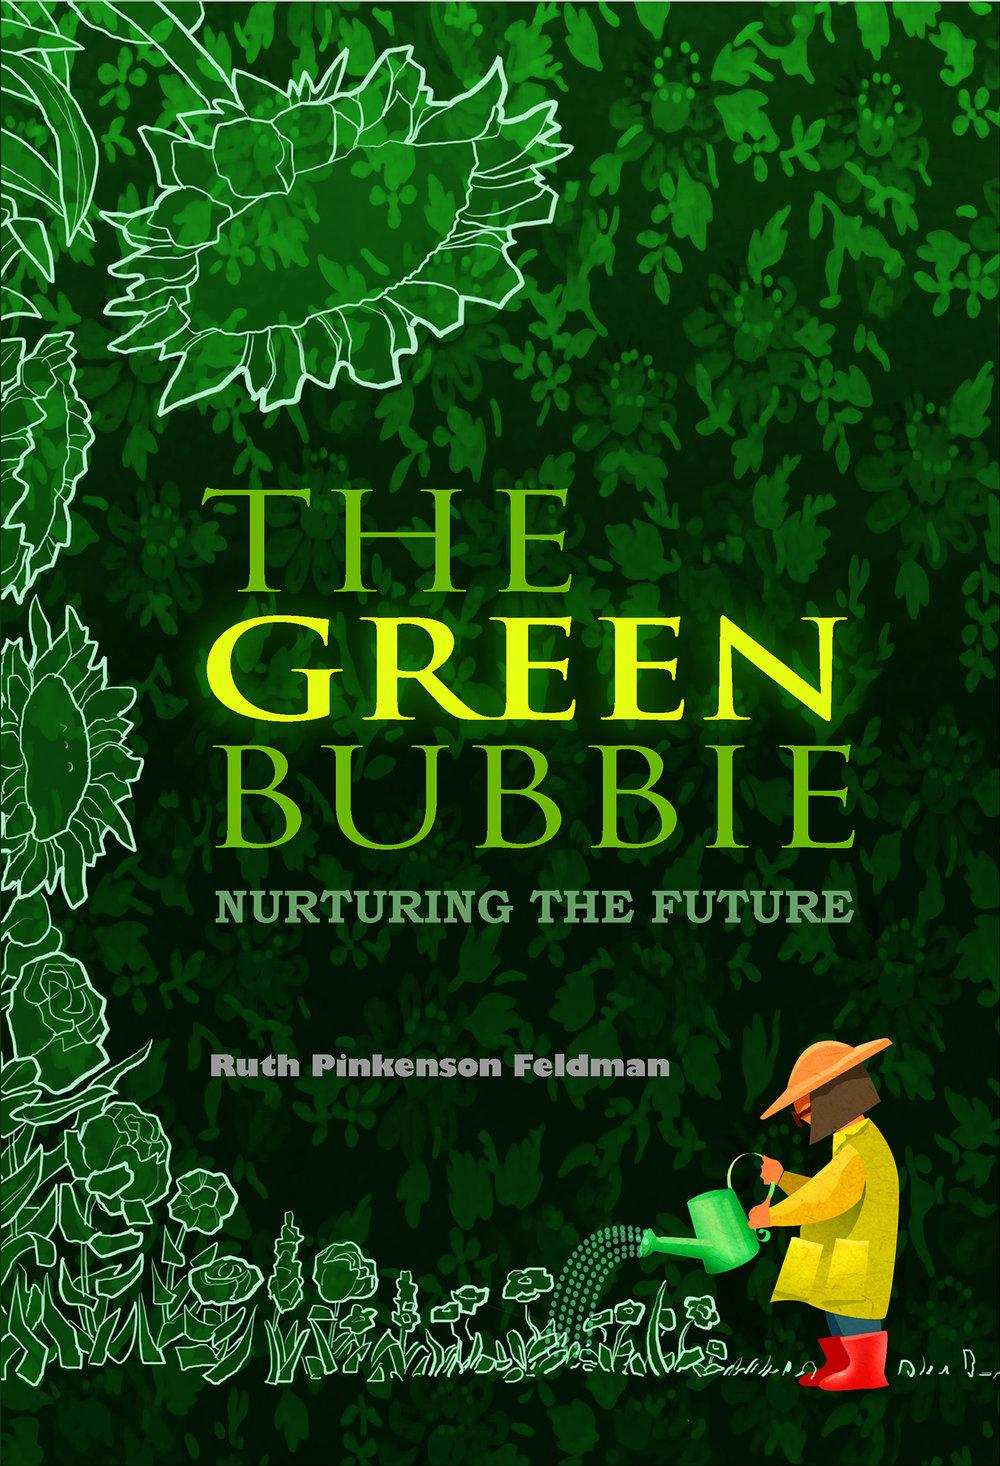 Green Bubbie Cover Book Cover, Daliya Publishing, 2014